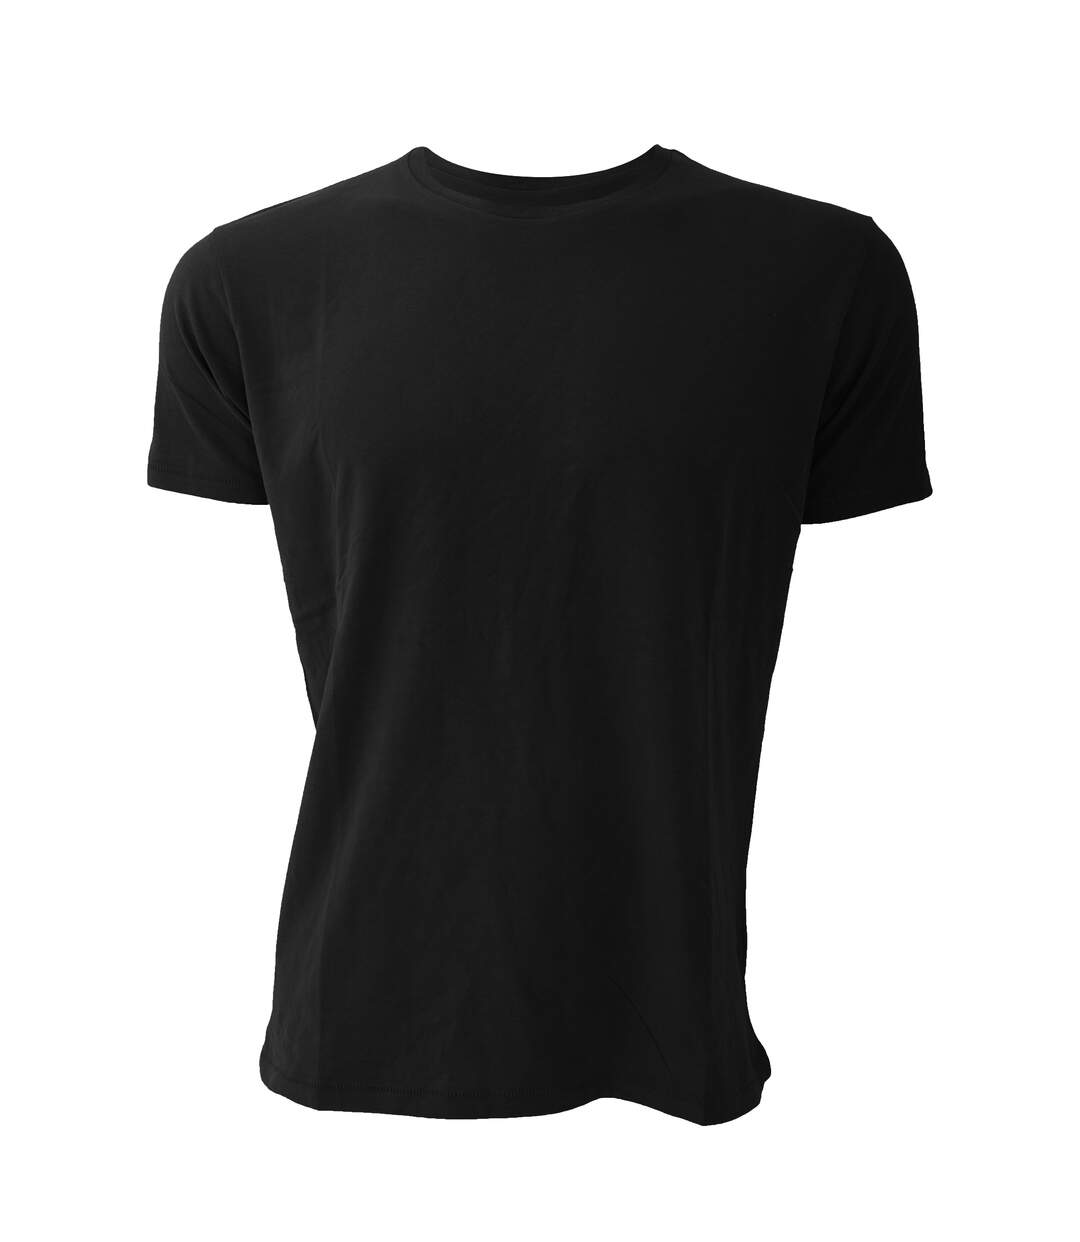 Mantis Mens Superstar Short Sleeve T-Shirt (Black) - UTBC675